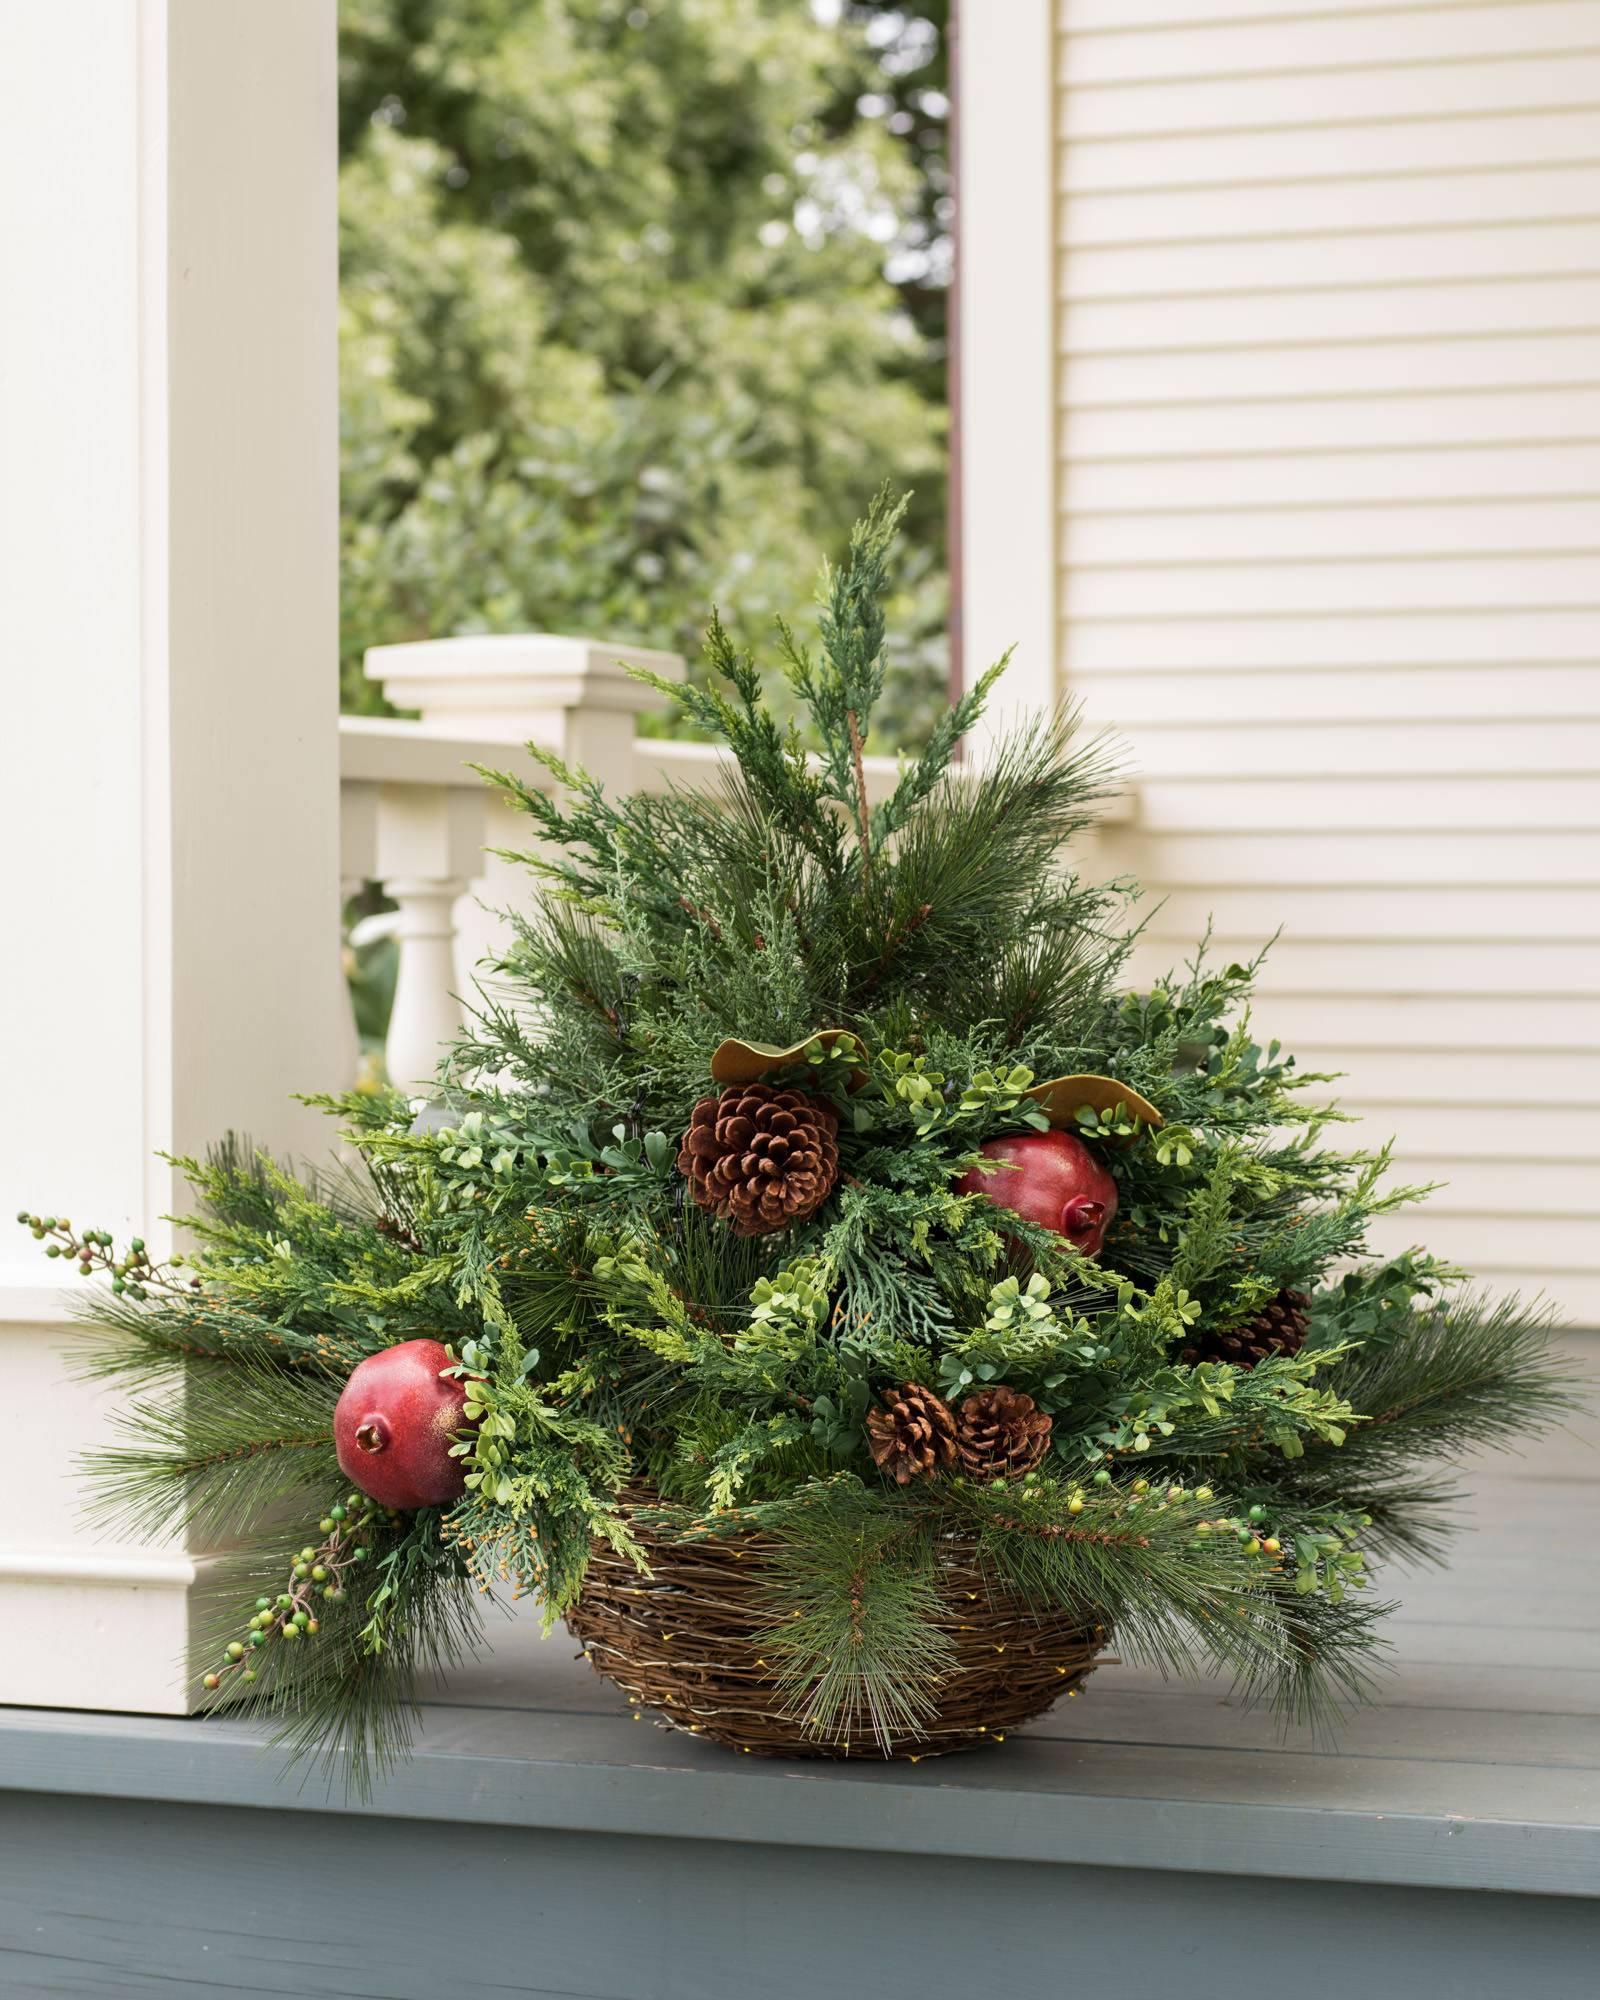 Christmas Hanging Baskets.Led Mixed Pine Hanging Basket Balsam Hill Uk